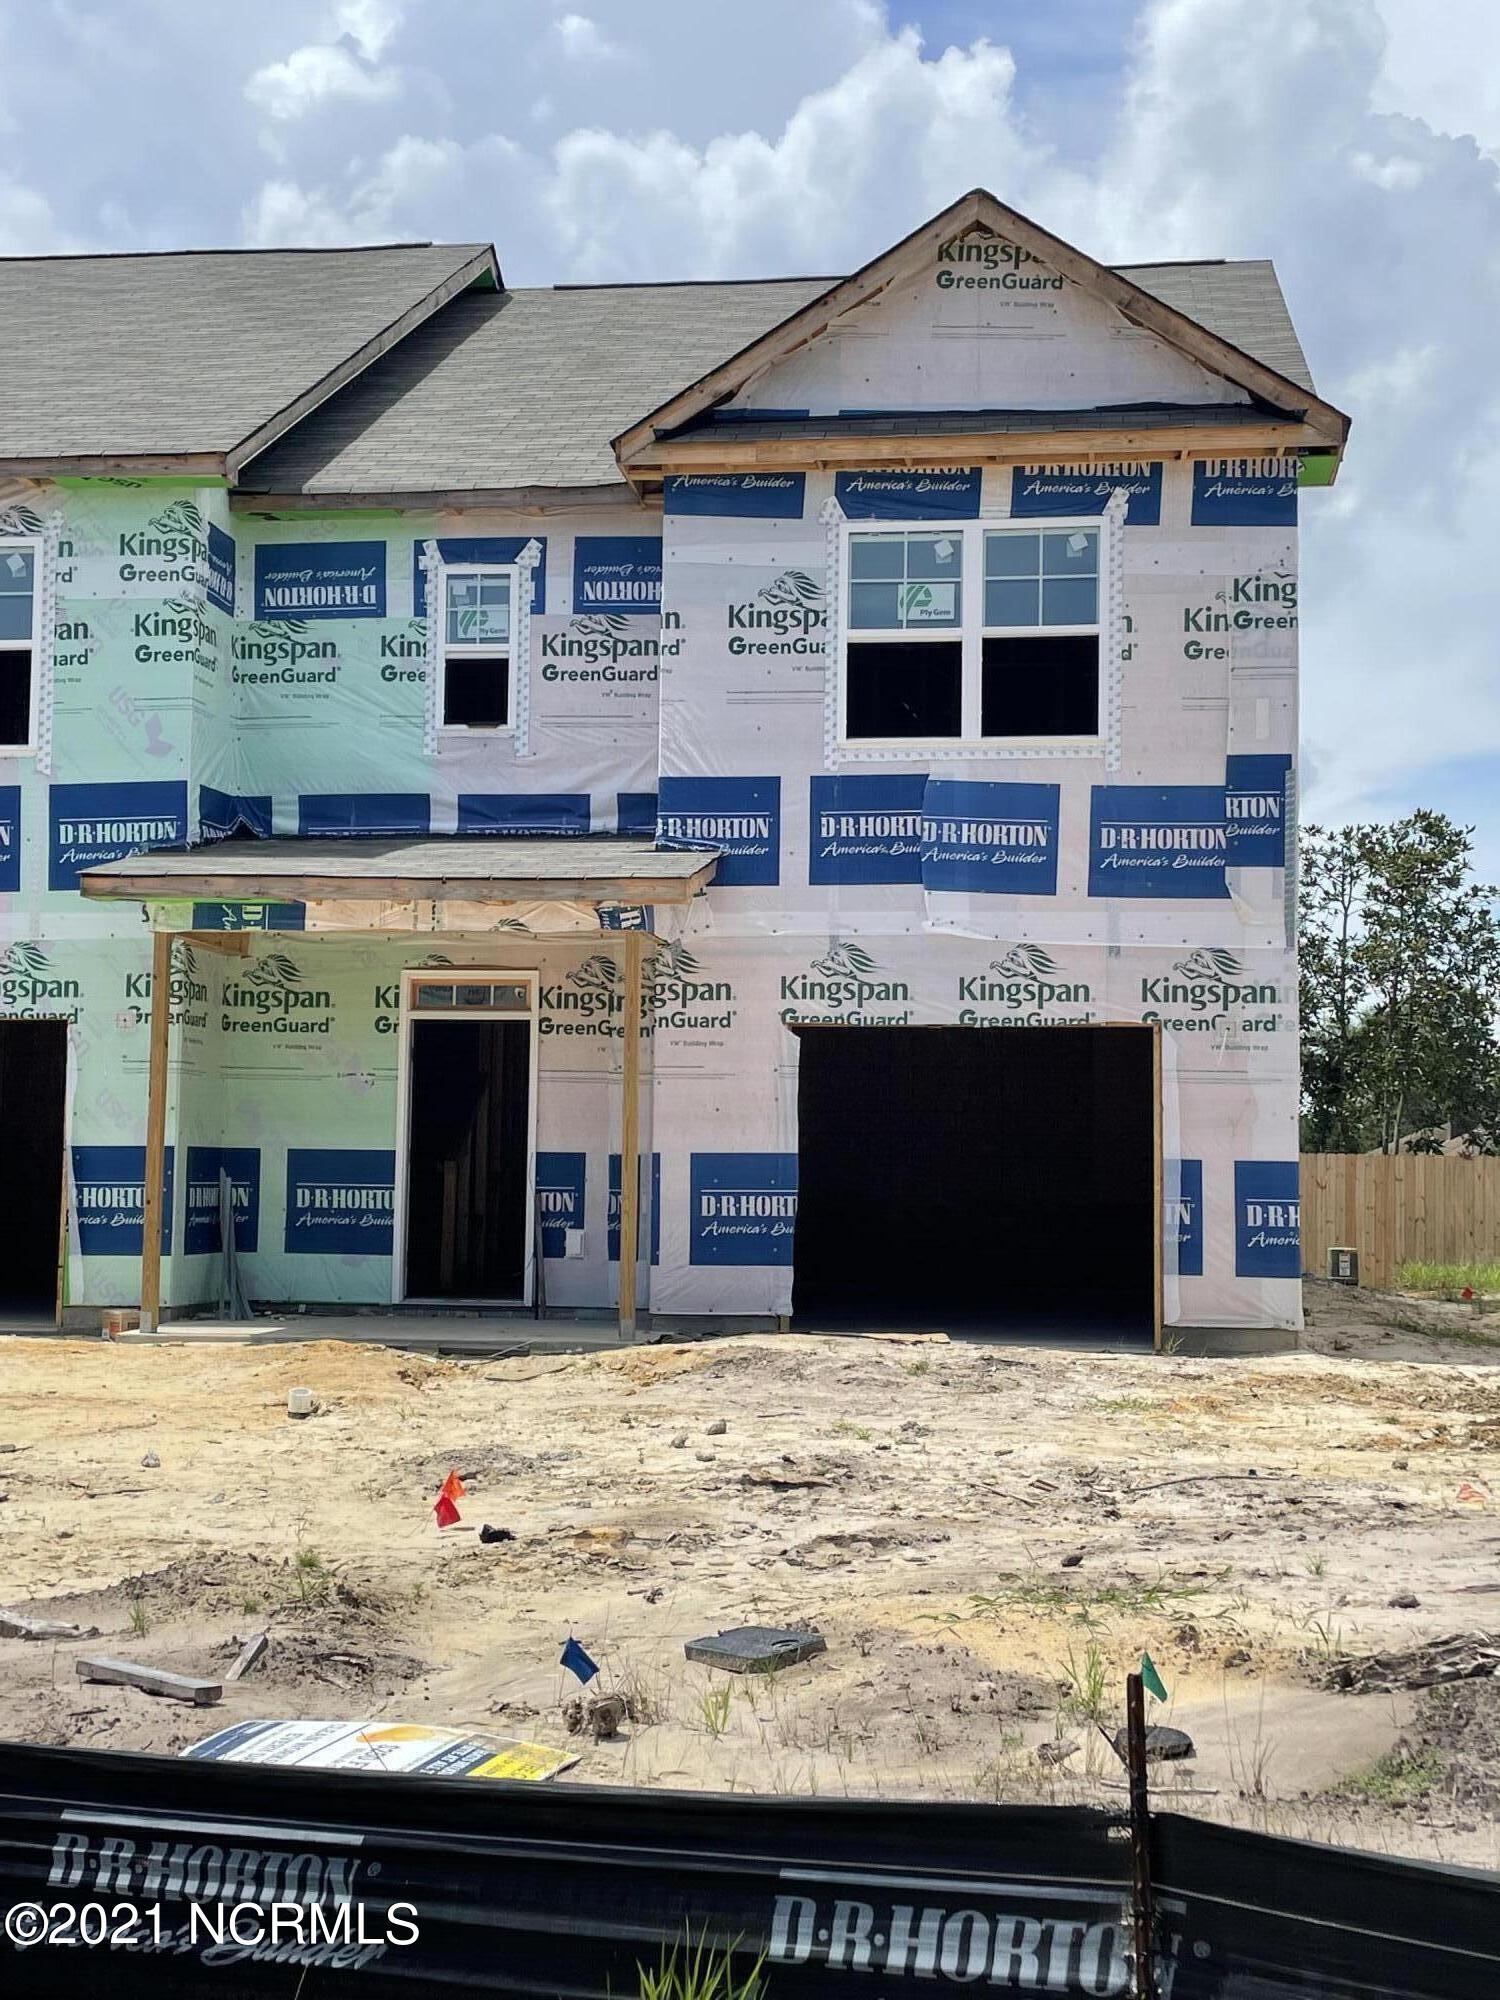 1643 Killdeer Lane, Wilmington, North Carolina 28411, 3 Bedrooms Bedrooms, 7 Rooms Rooms,2 BathroomsBathrooms,Townhouse,For sale,Killdeer,100282288